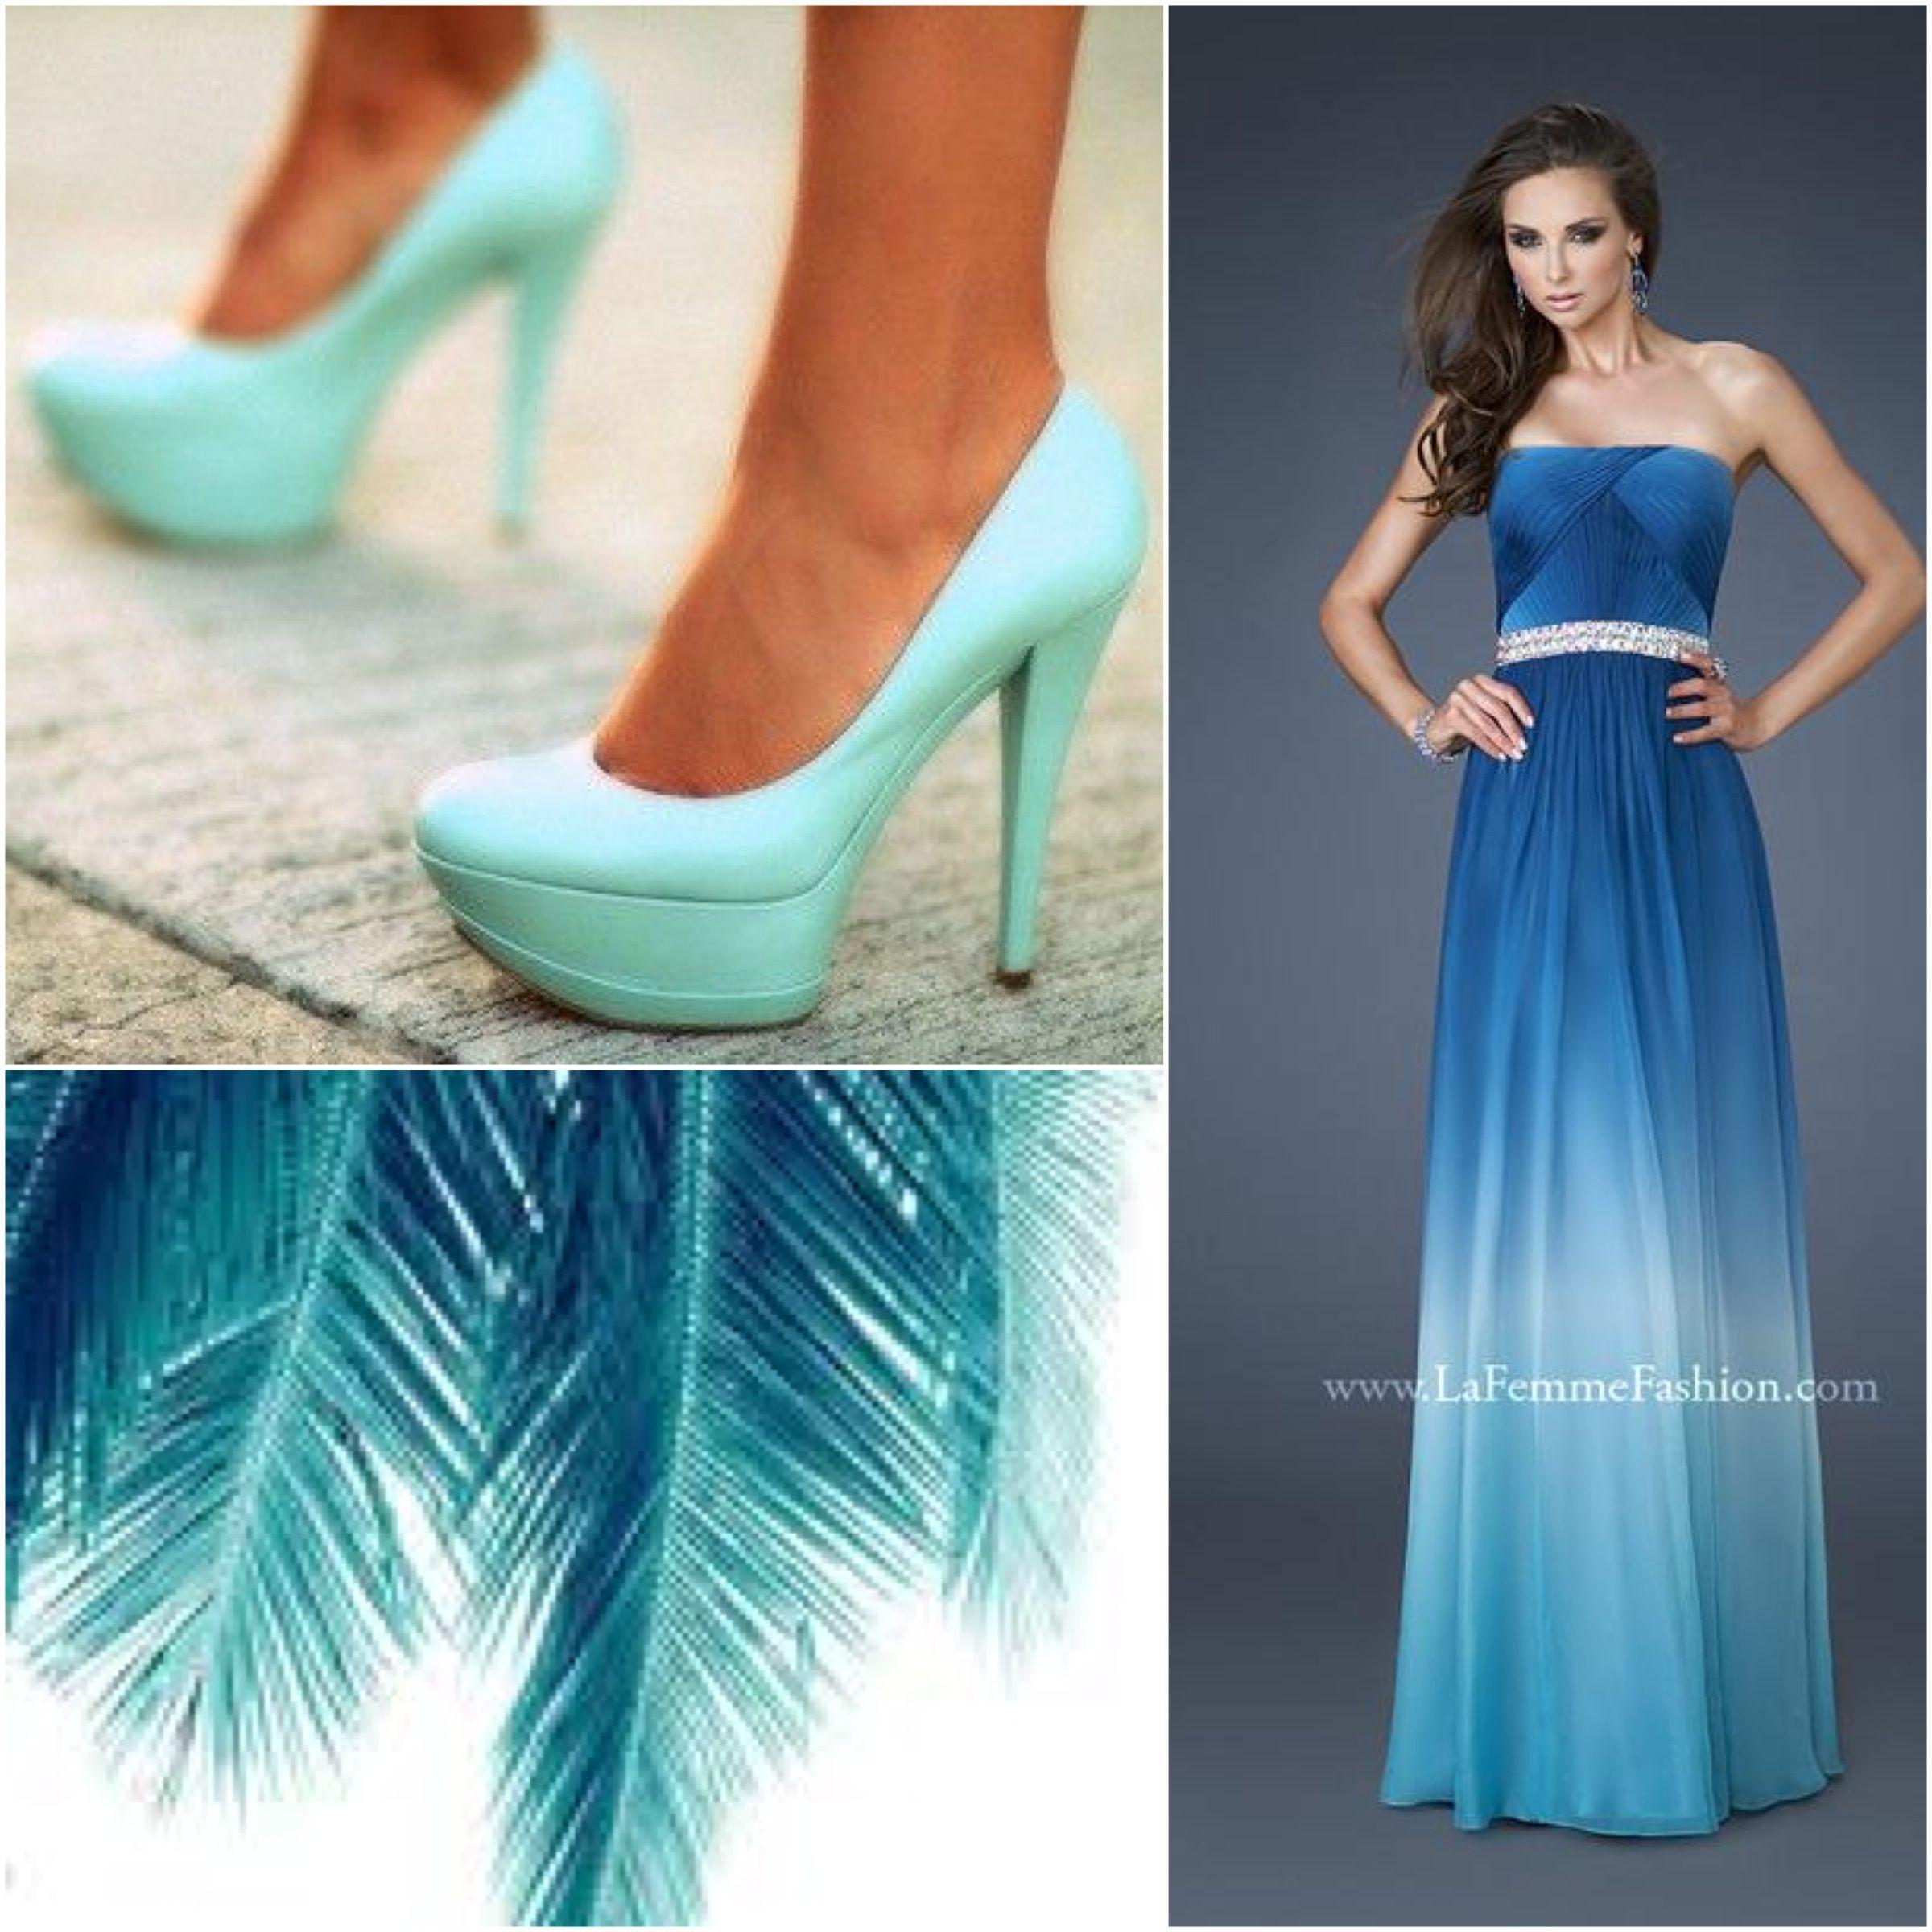 Ocean Blue and Gold Prom Dresses_Prom Dresses_dressesss